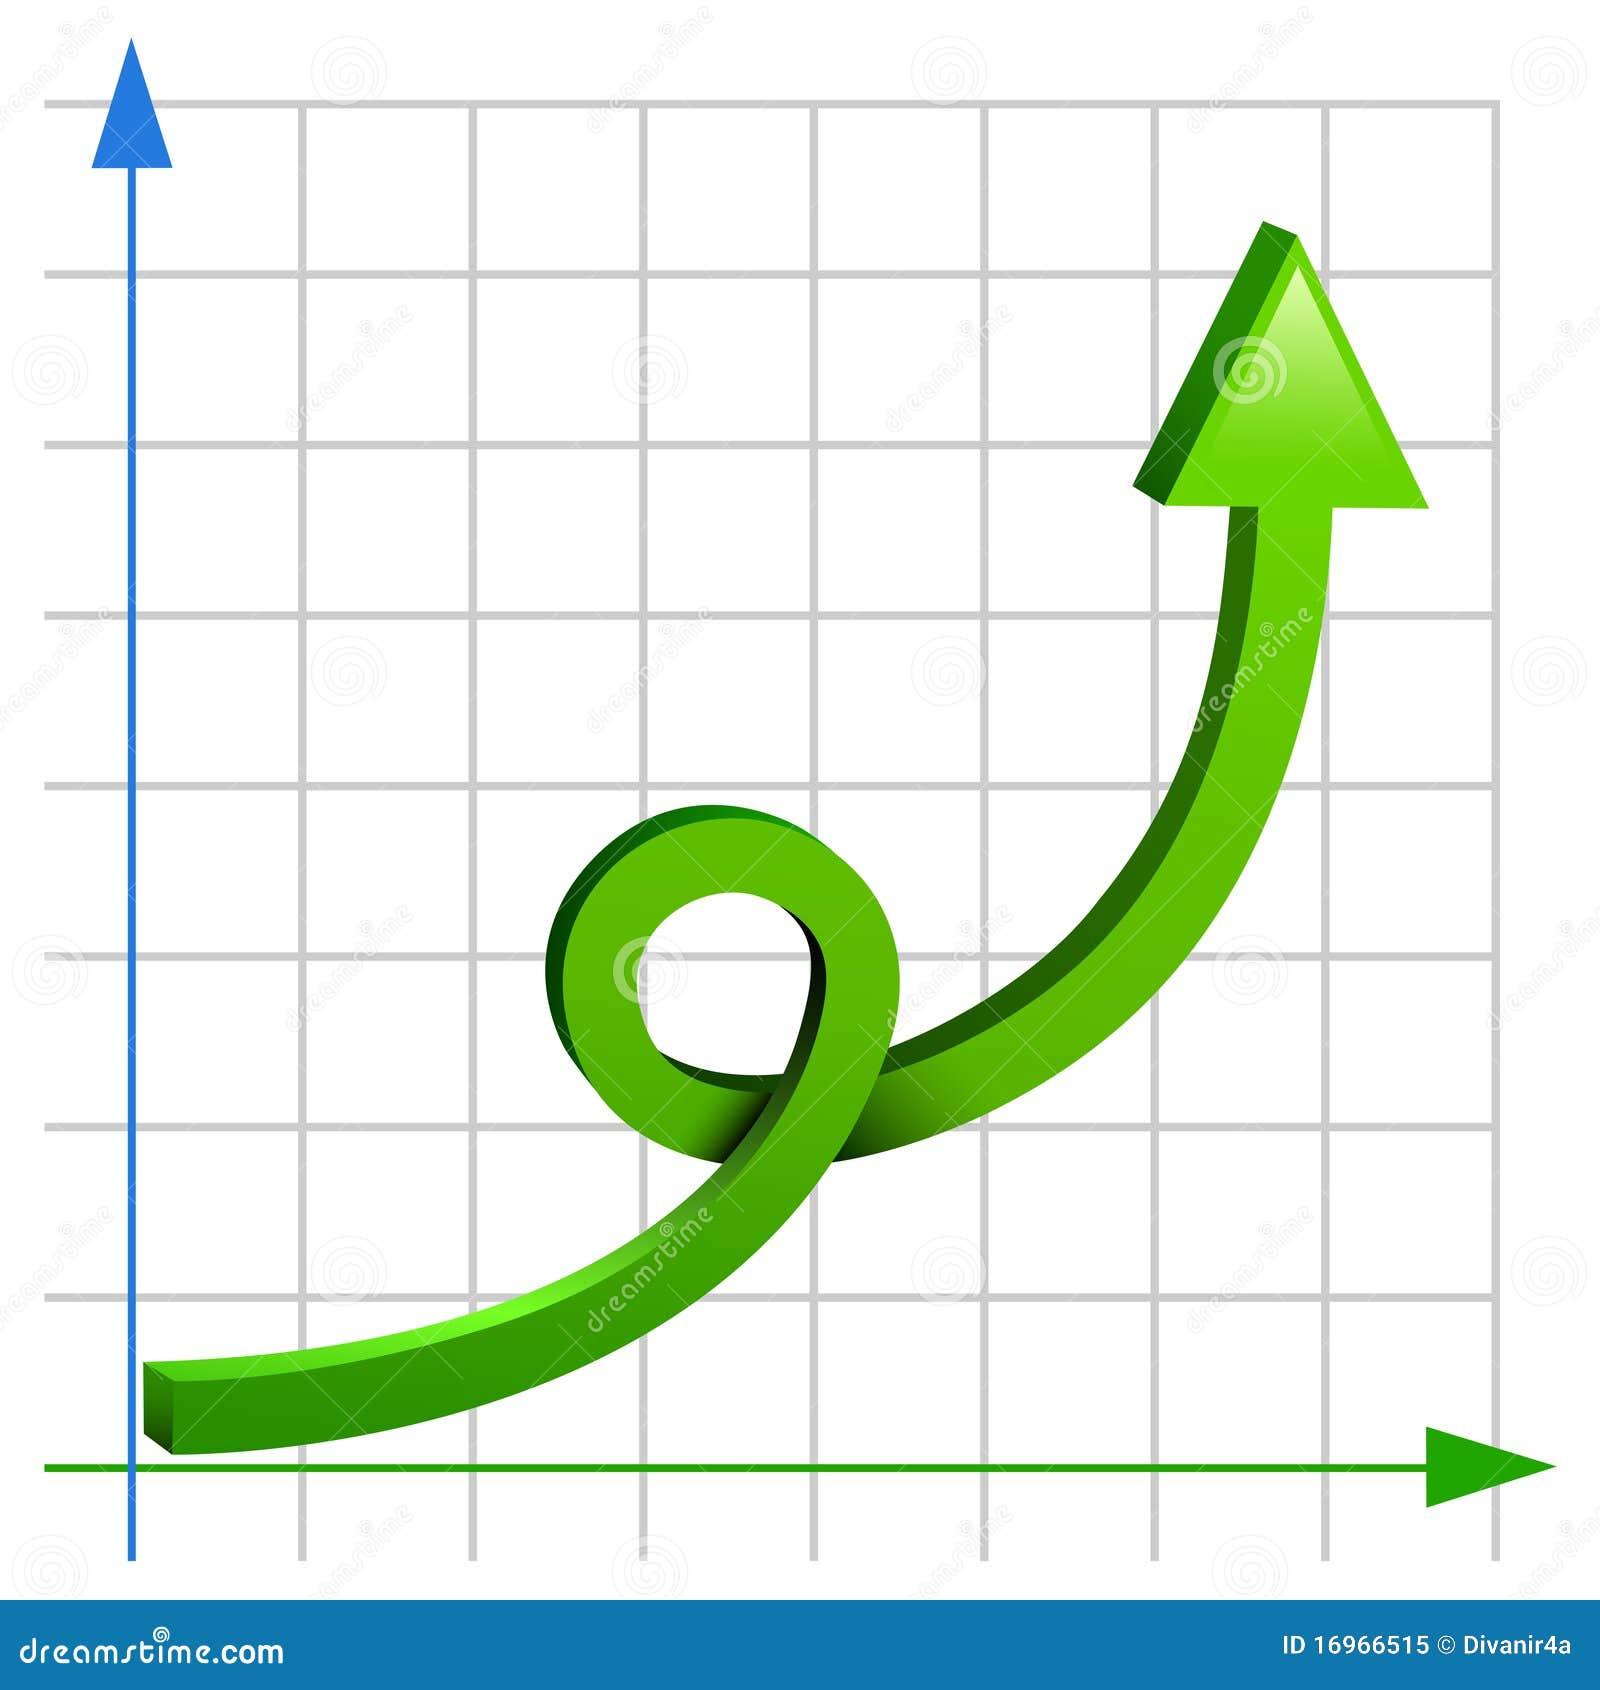 Gekke grafiek